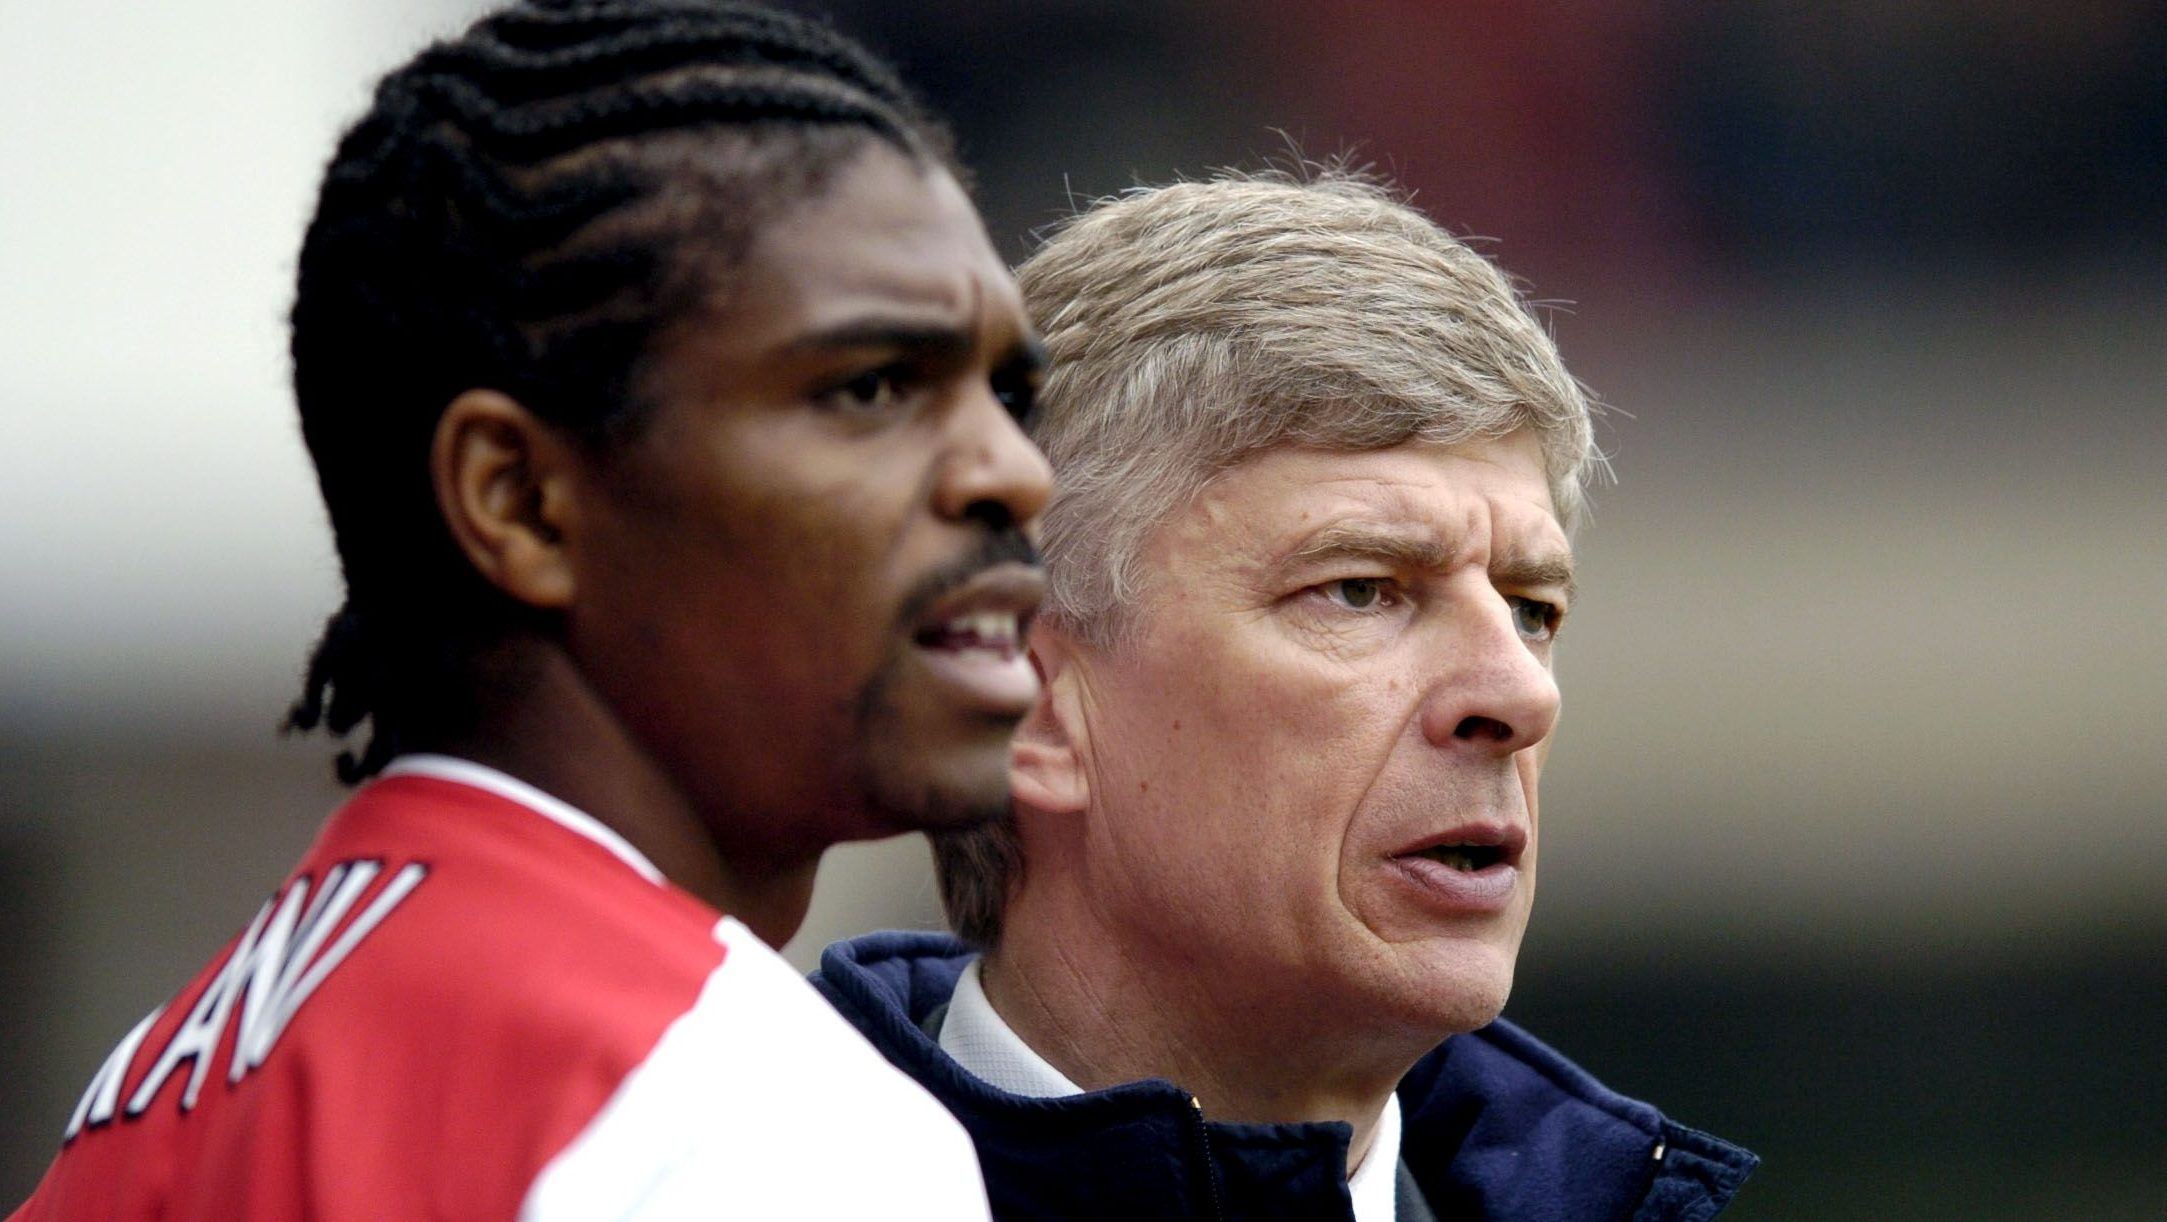 Football - FA Cup Semi-Final - Arsenal v Manchester United - Villa Park - 3/4/04  Arsene Wenger - Arsenal Manager and Nwankwo Kanu